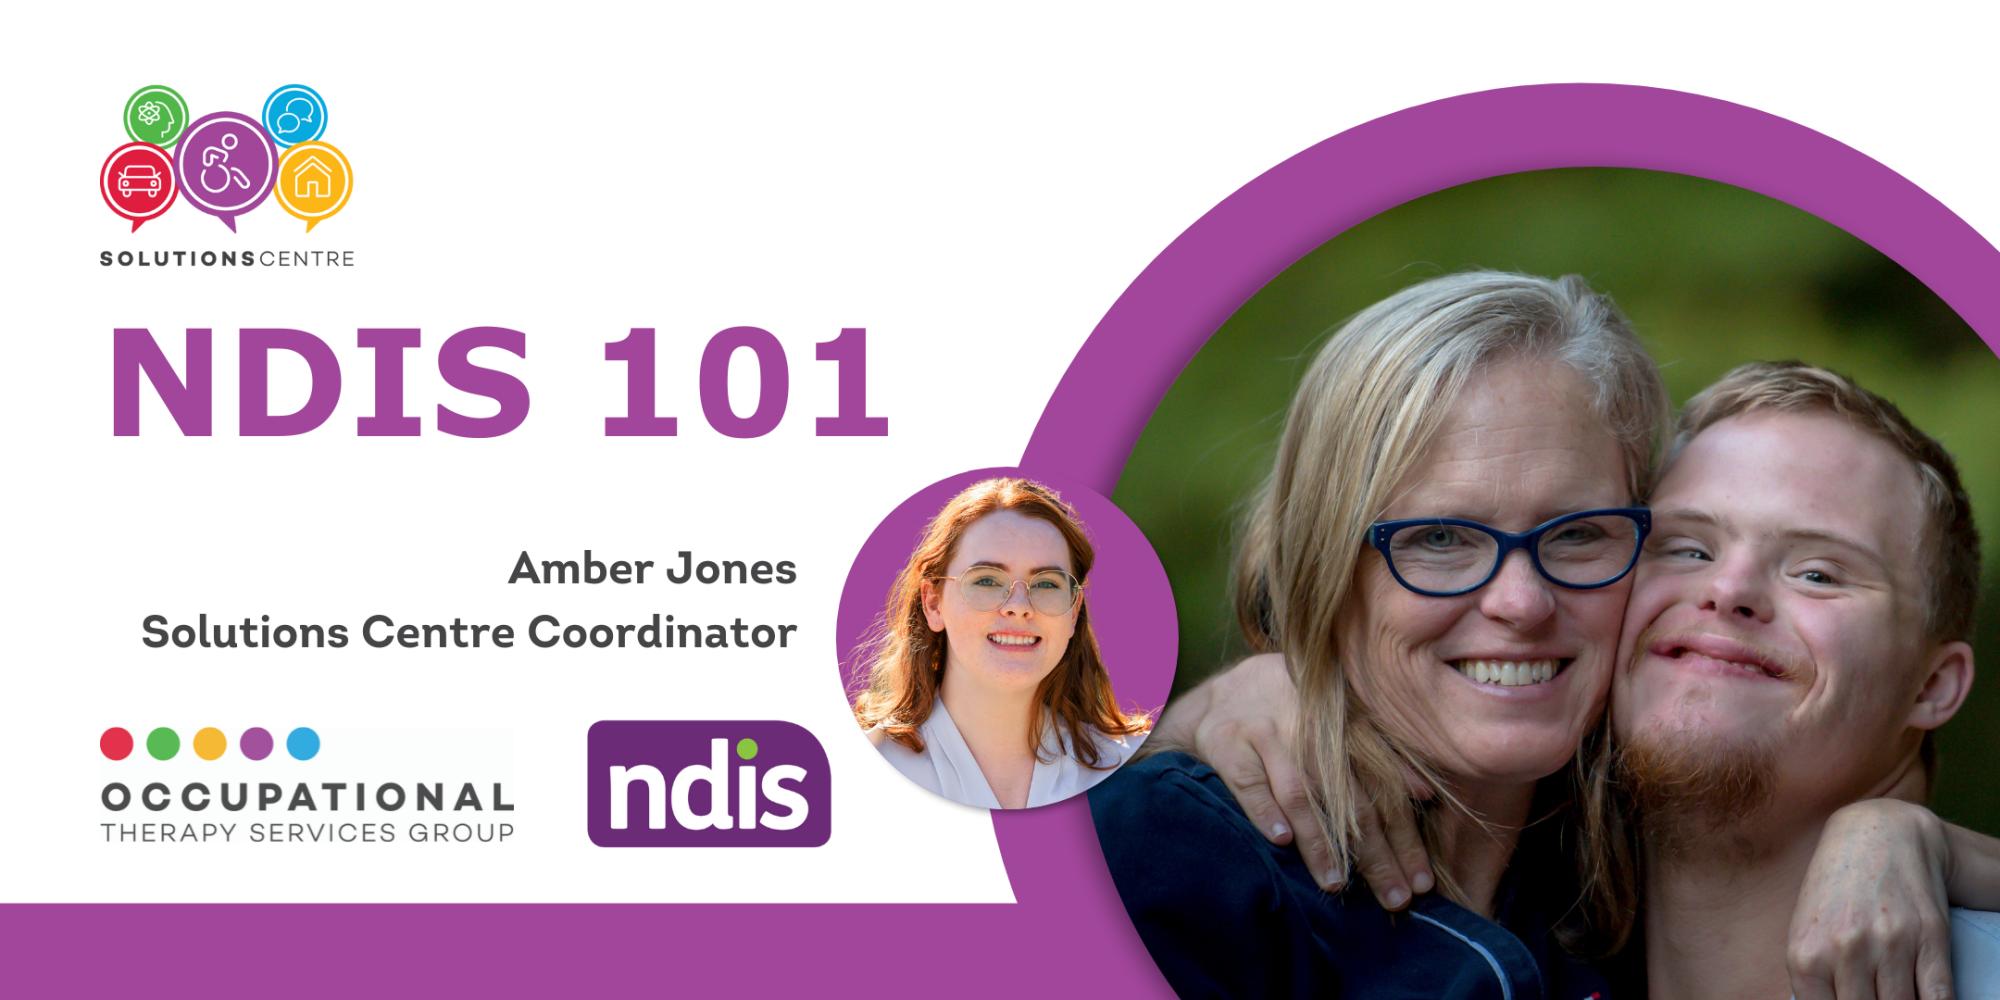 NDIS 101